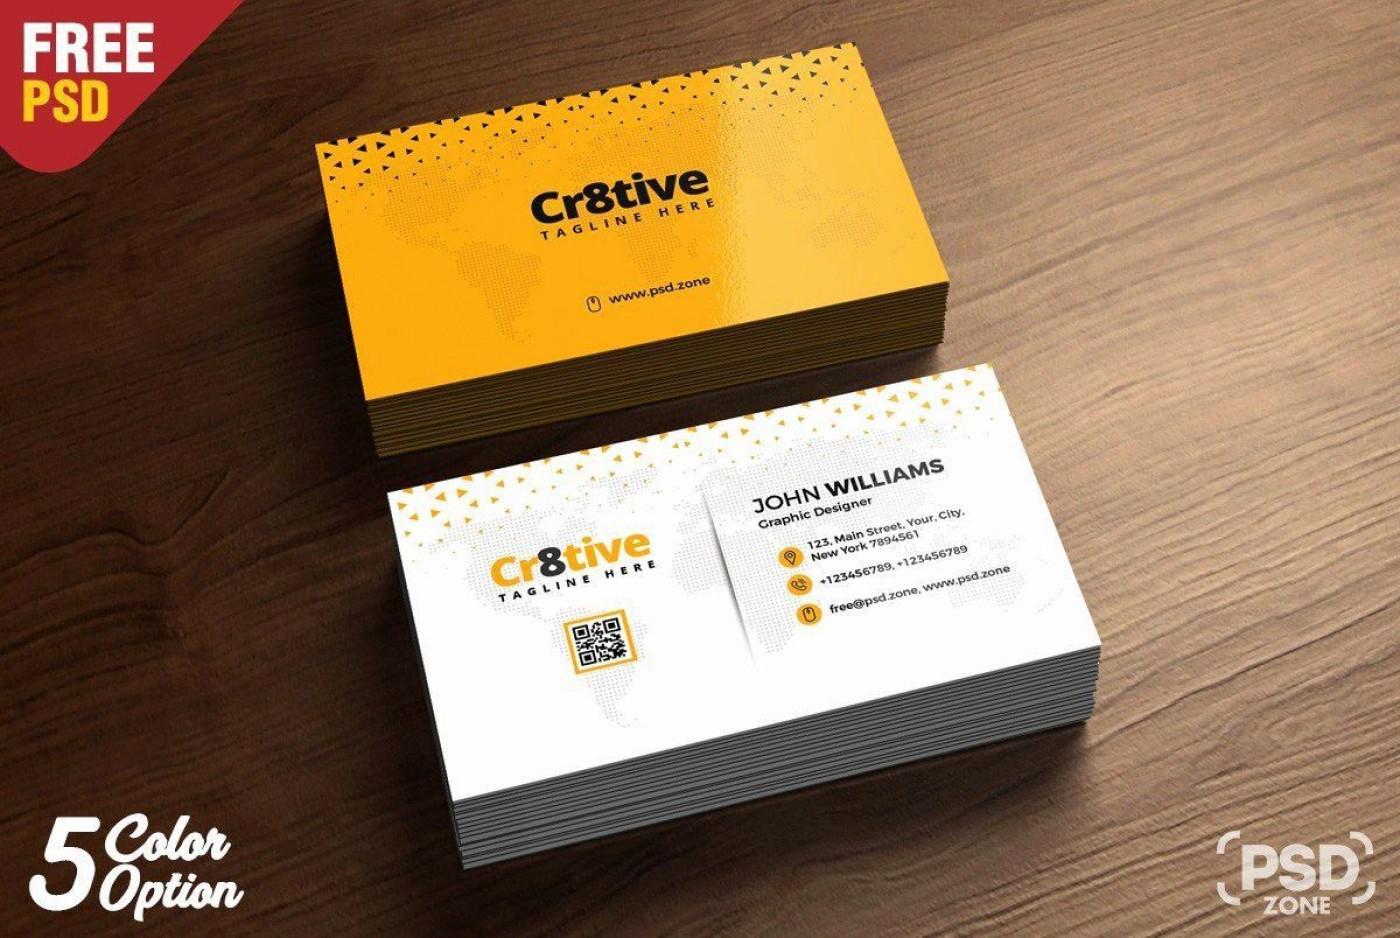 007 Best Simple Busines Card Design Template Free Photo  Minimalist Psd Download1400